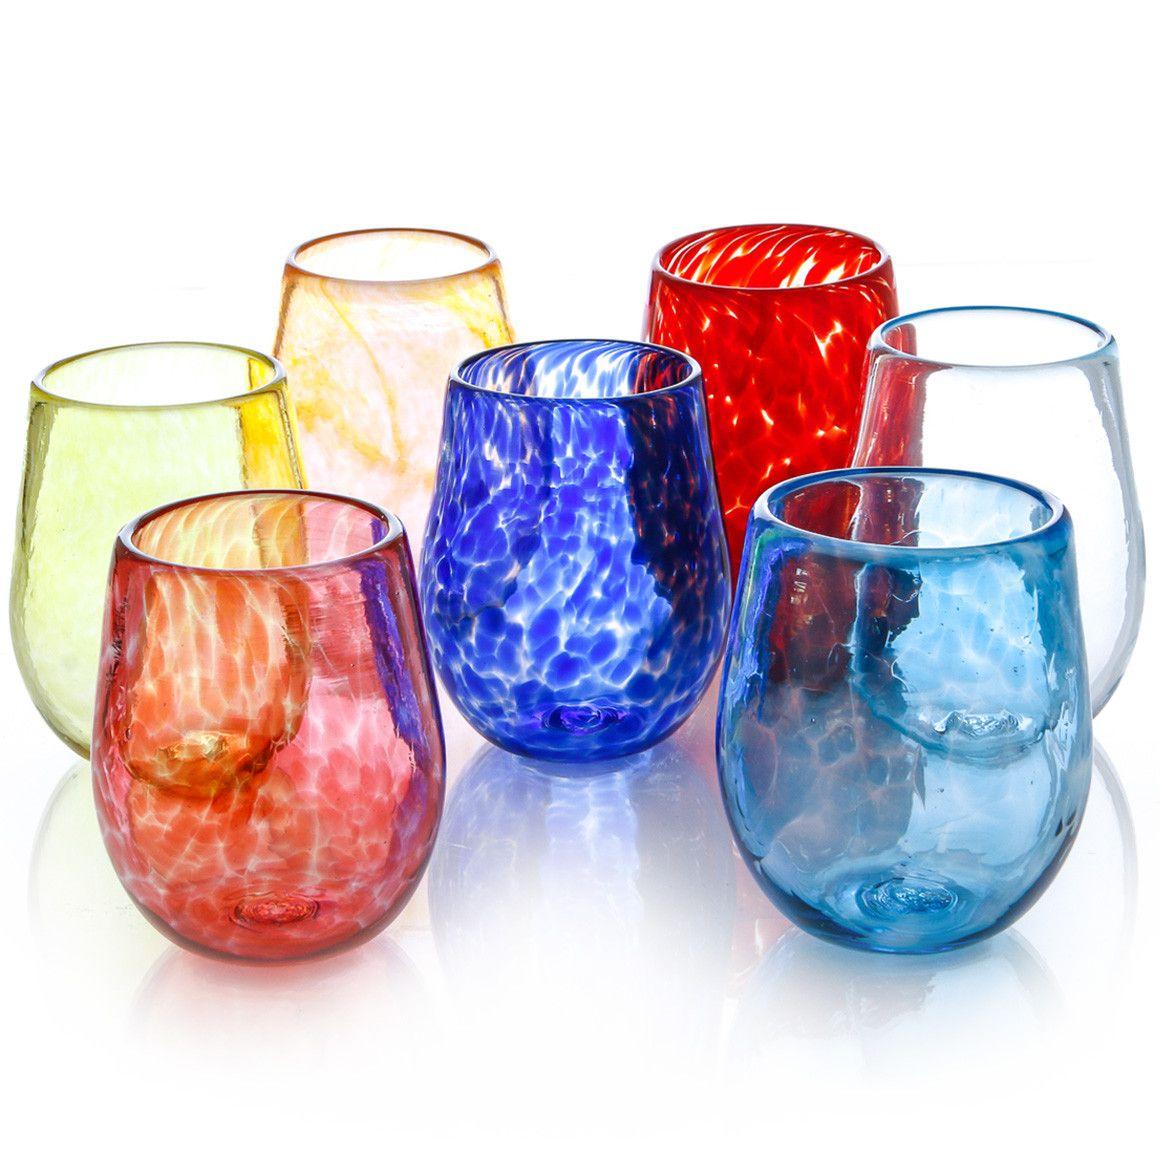 Vibrant Stemless Wine Glasses Set of 4 - Cheryl Saban Designs  - 2